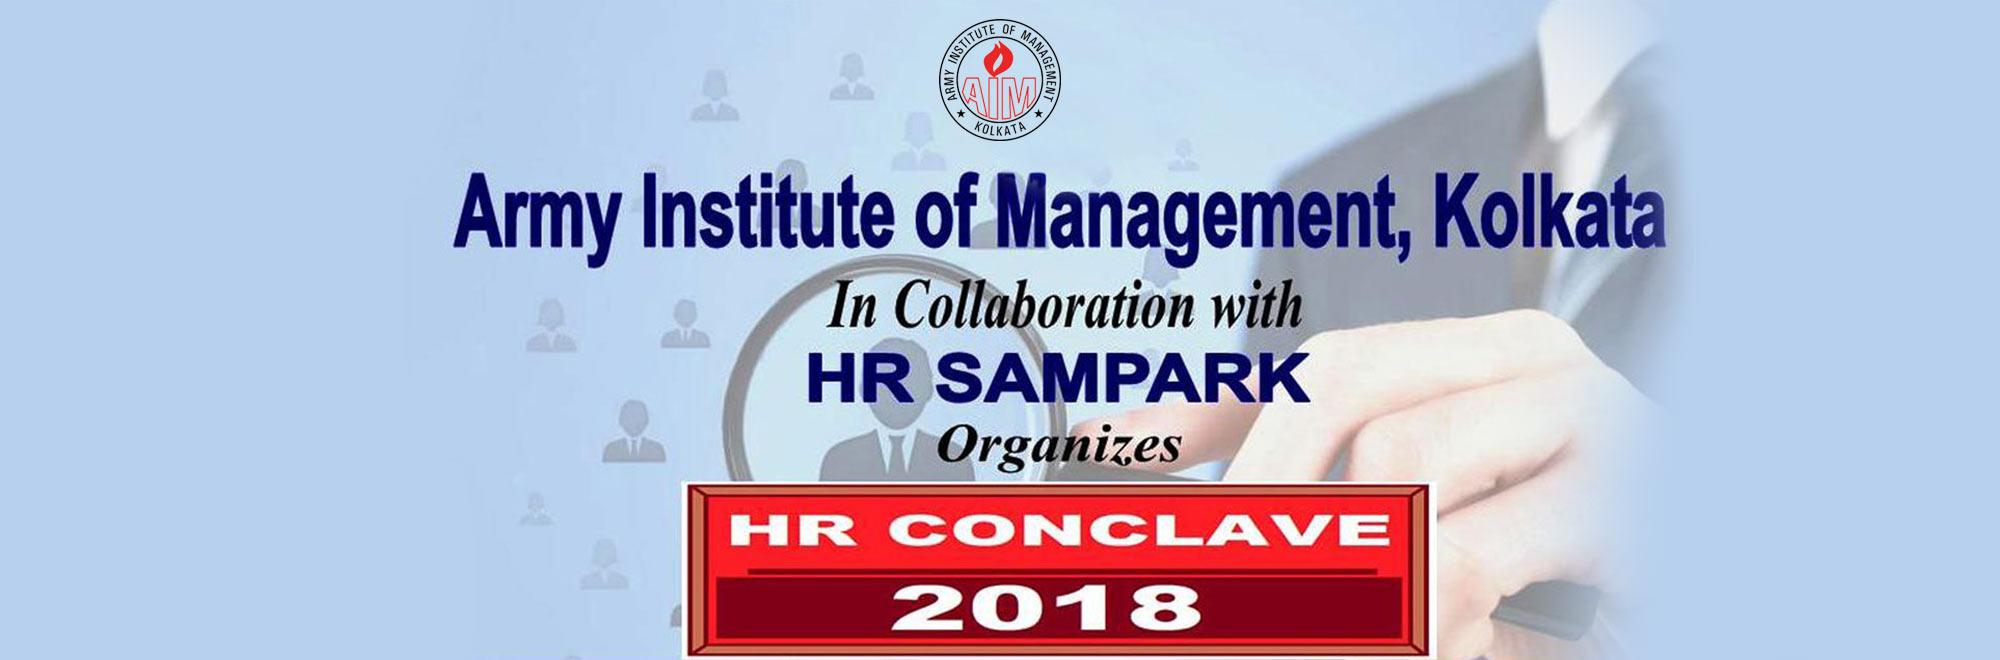 AIM | Army Institute of Management Kolkata